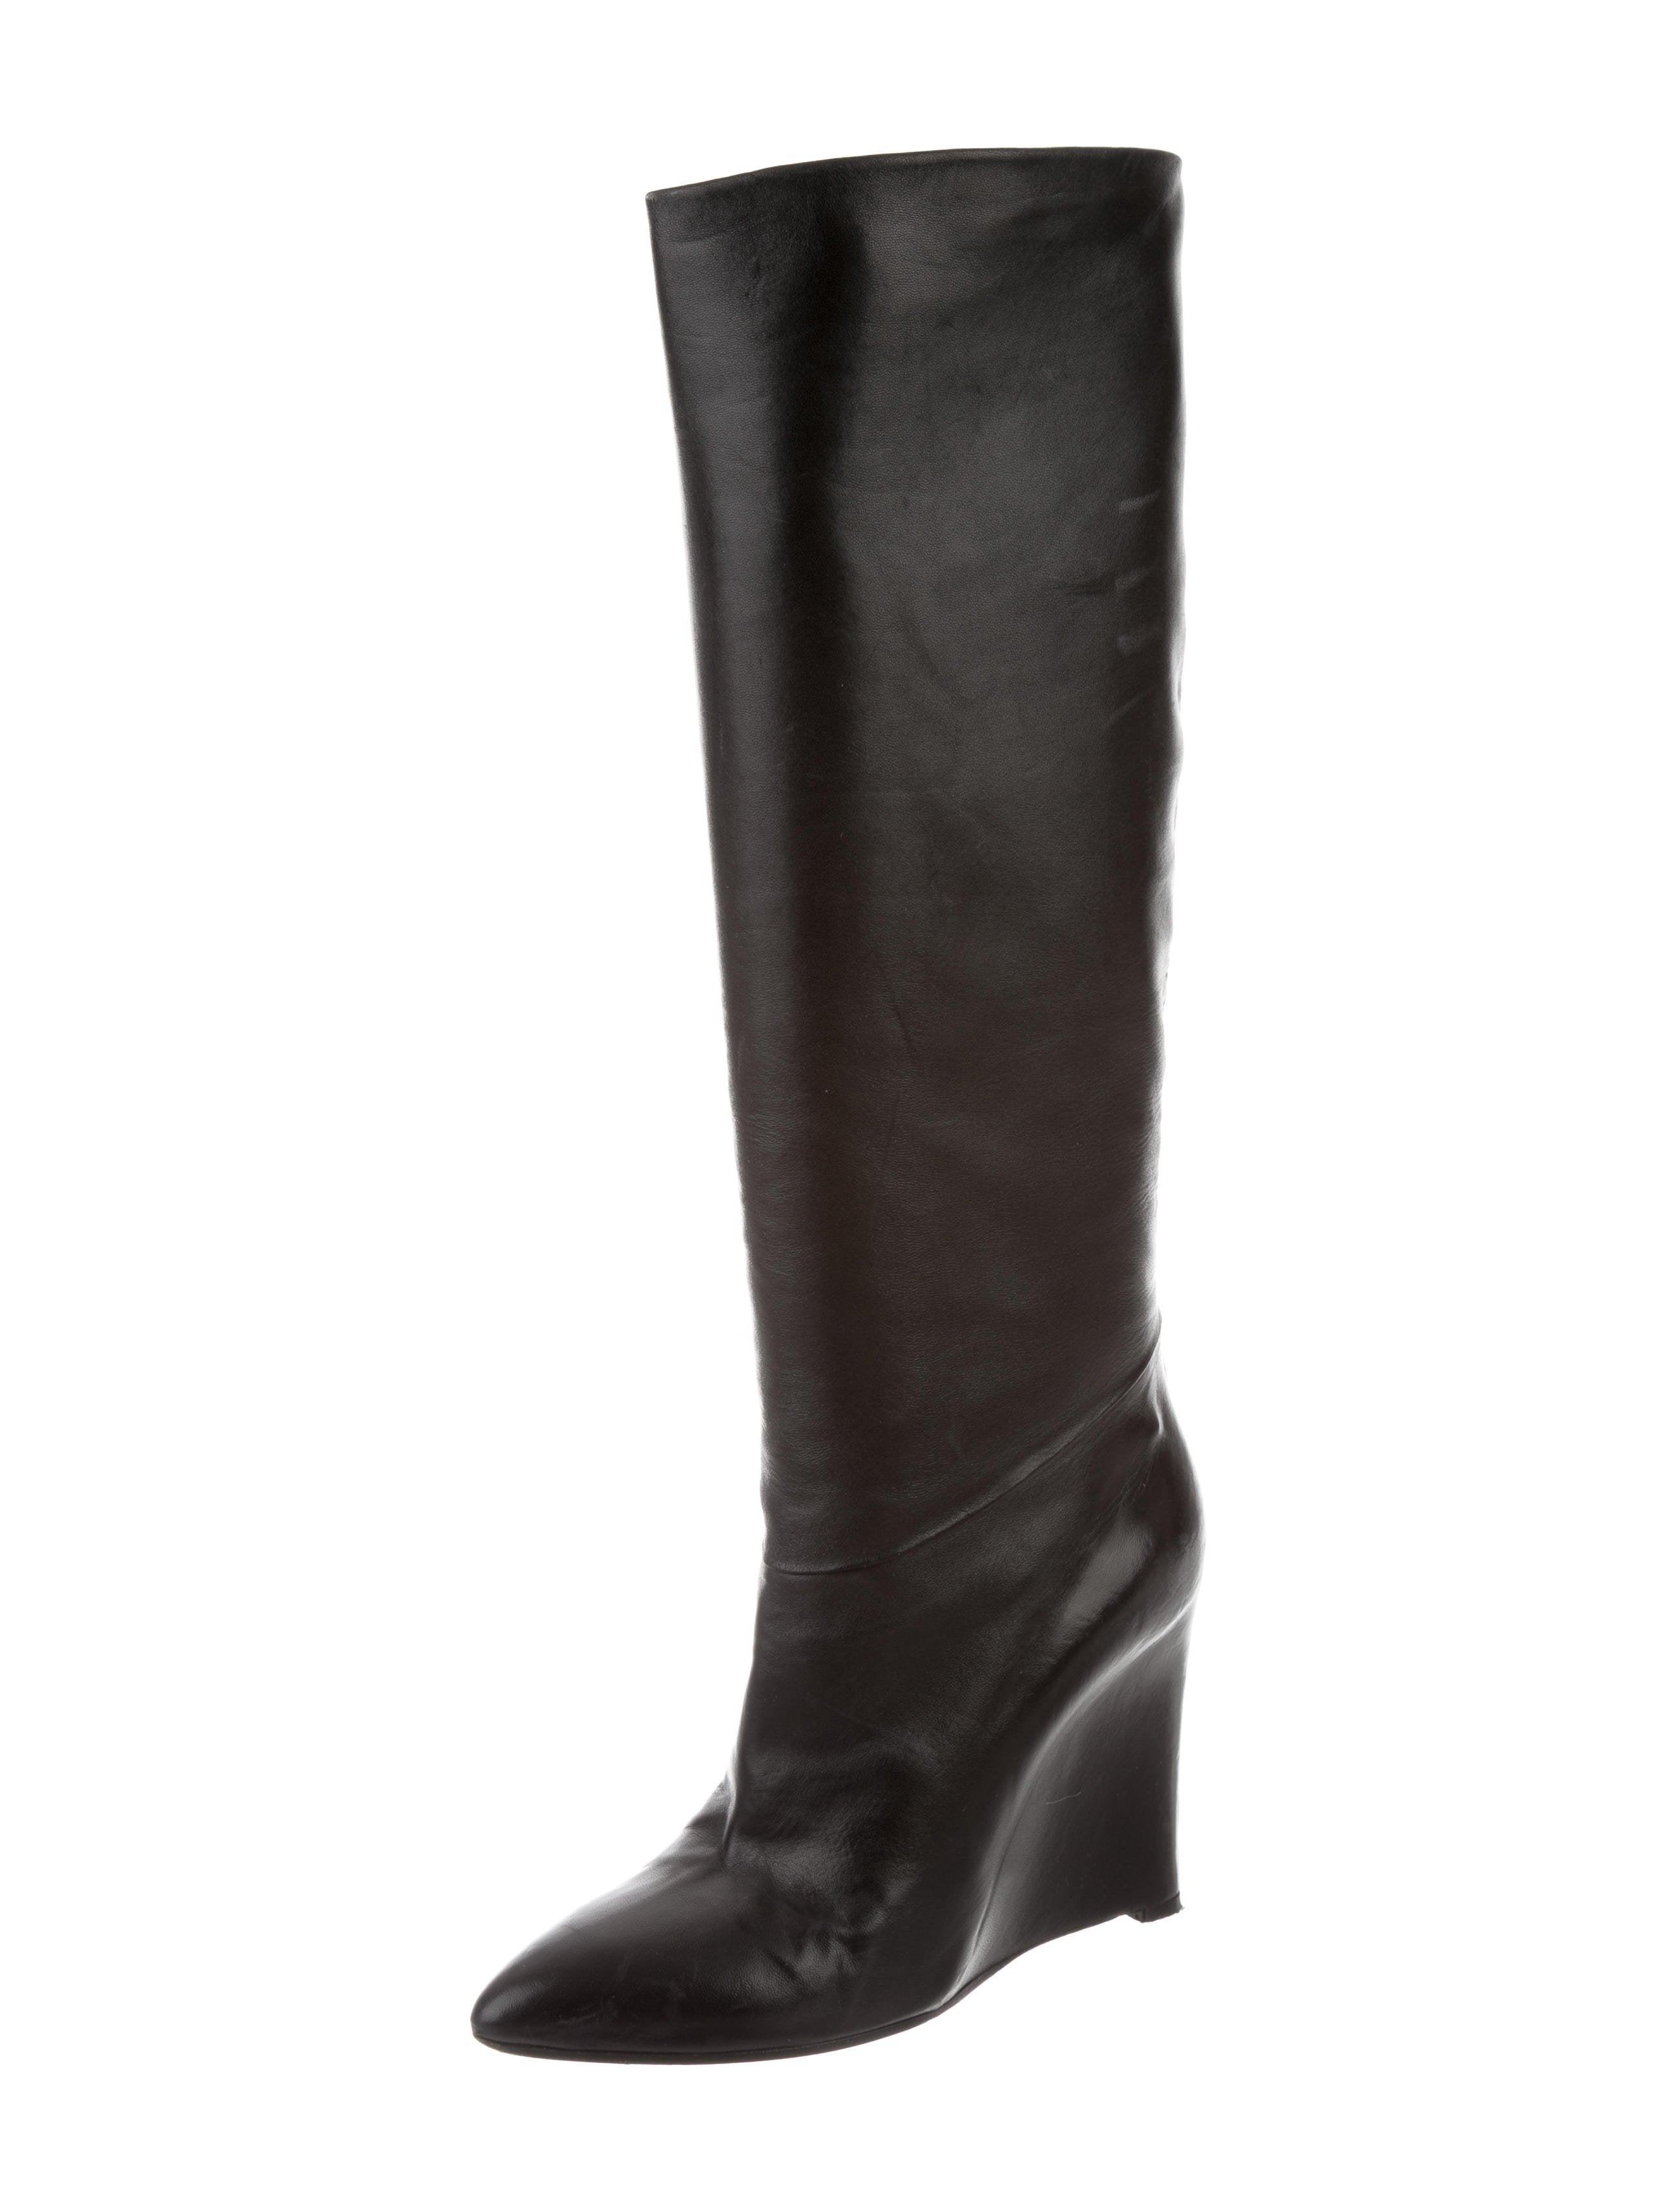 maison martin margiela leather wedge boots shoes